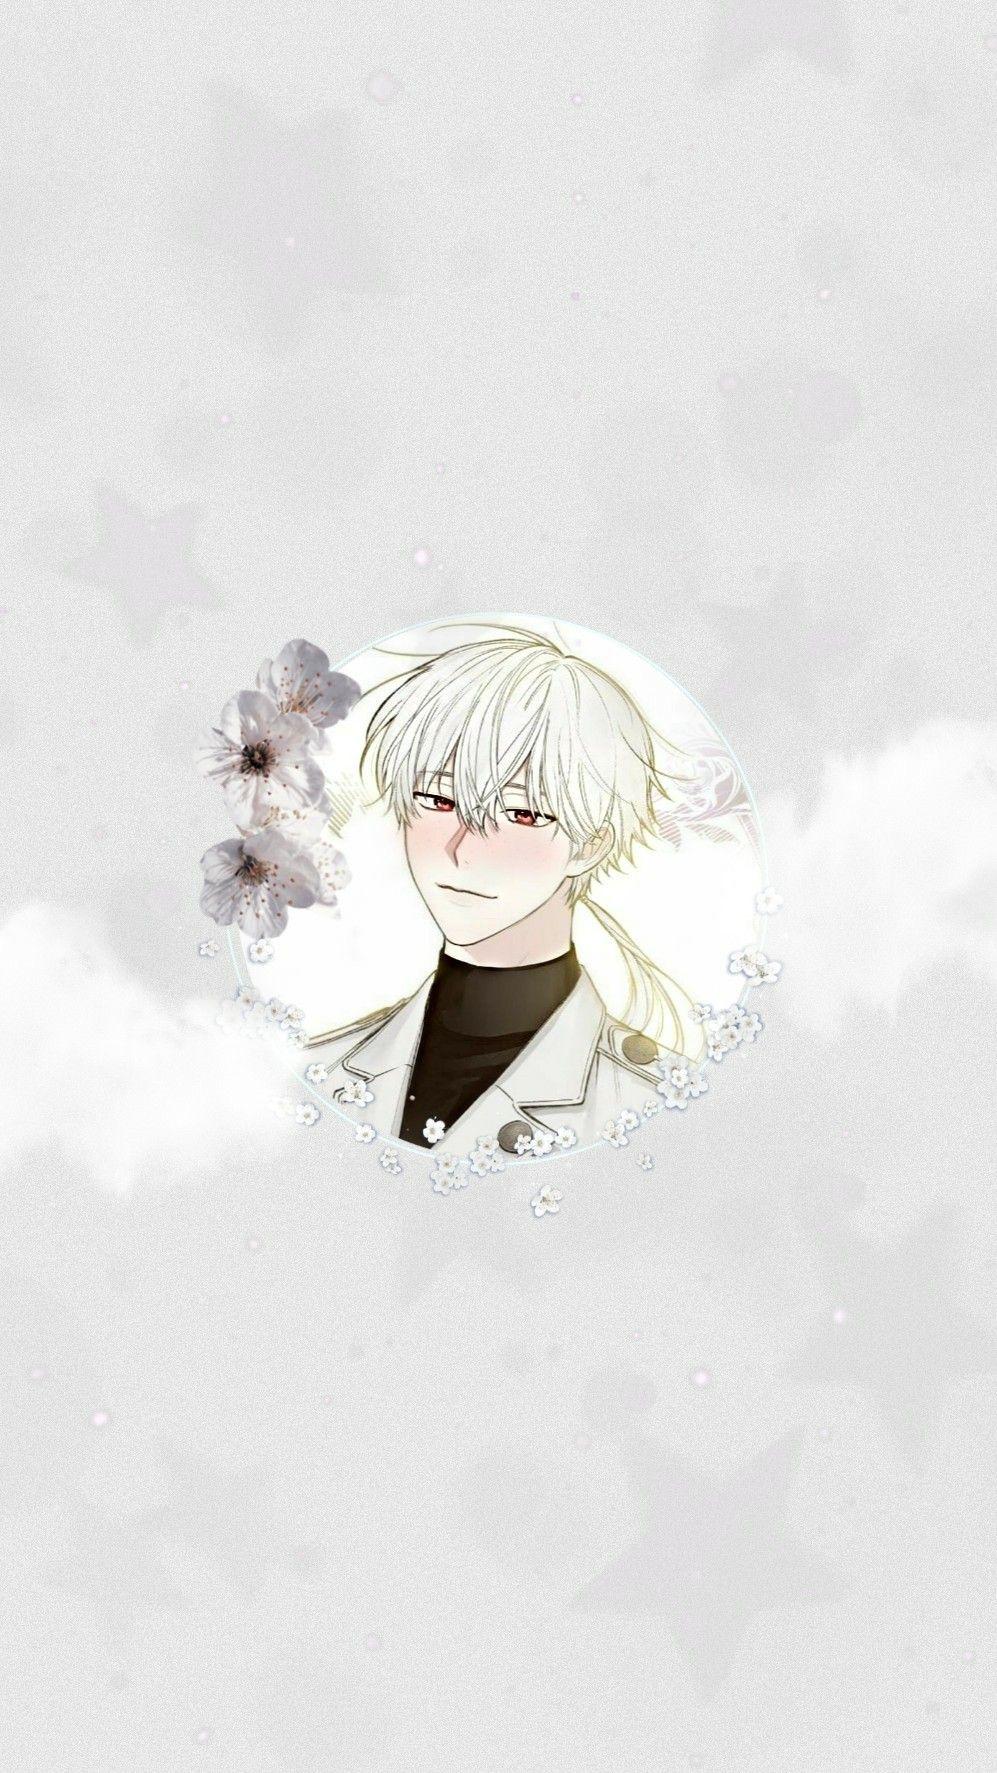 Wᥲᥣᥣrᥲrᥱr Zᥱᥒ Mყstiᥴ Mᥱssᥱᥒgᥱr Mystic Messenger Zen Mystic Messenger Anime Wallpaper